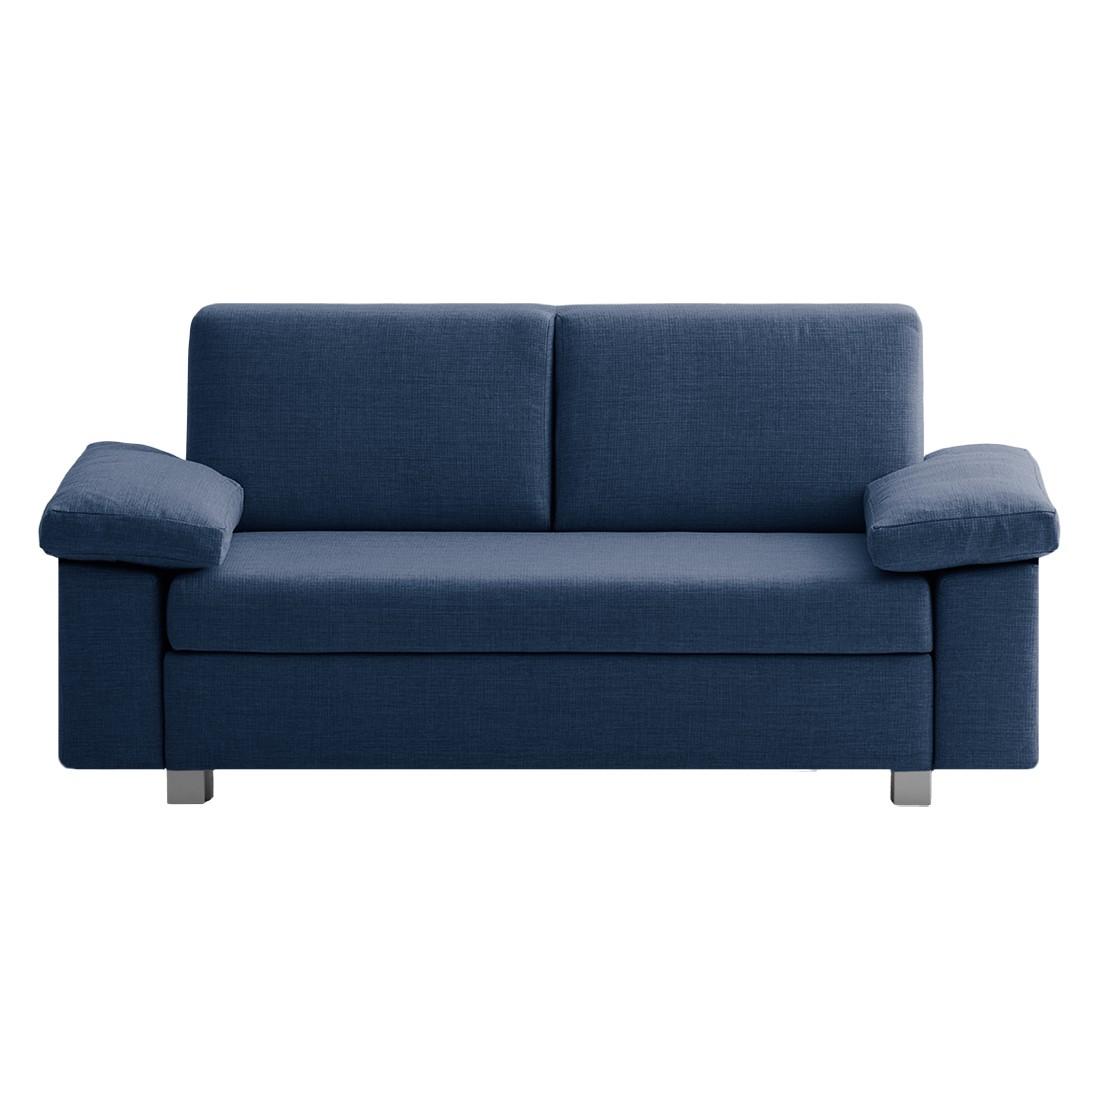 slaapbank 1 persoons ikea kopen online internetwinkel. Black Bedroom Furniture Sets. Home Design Ideas